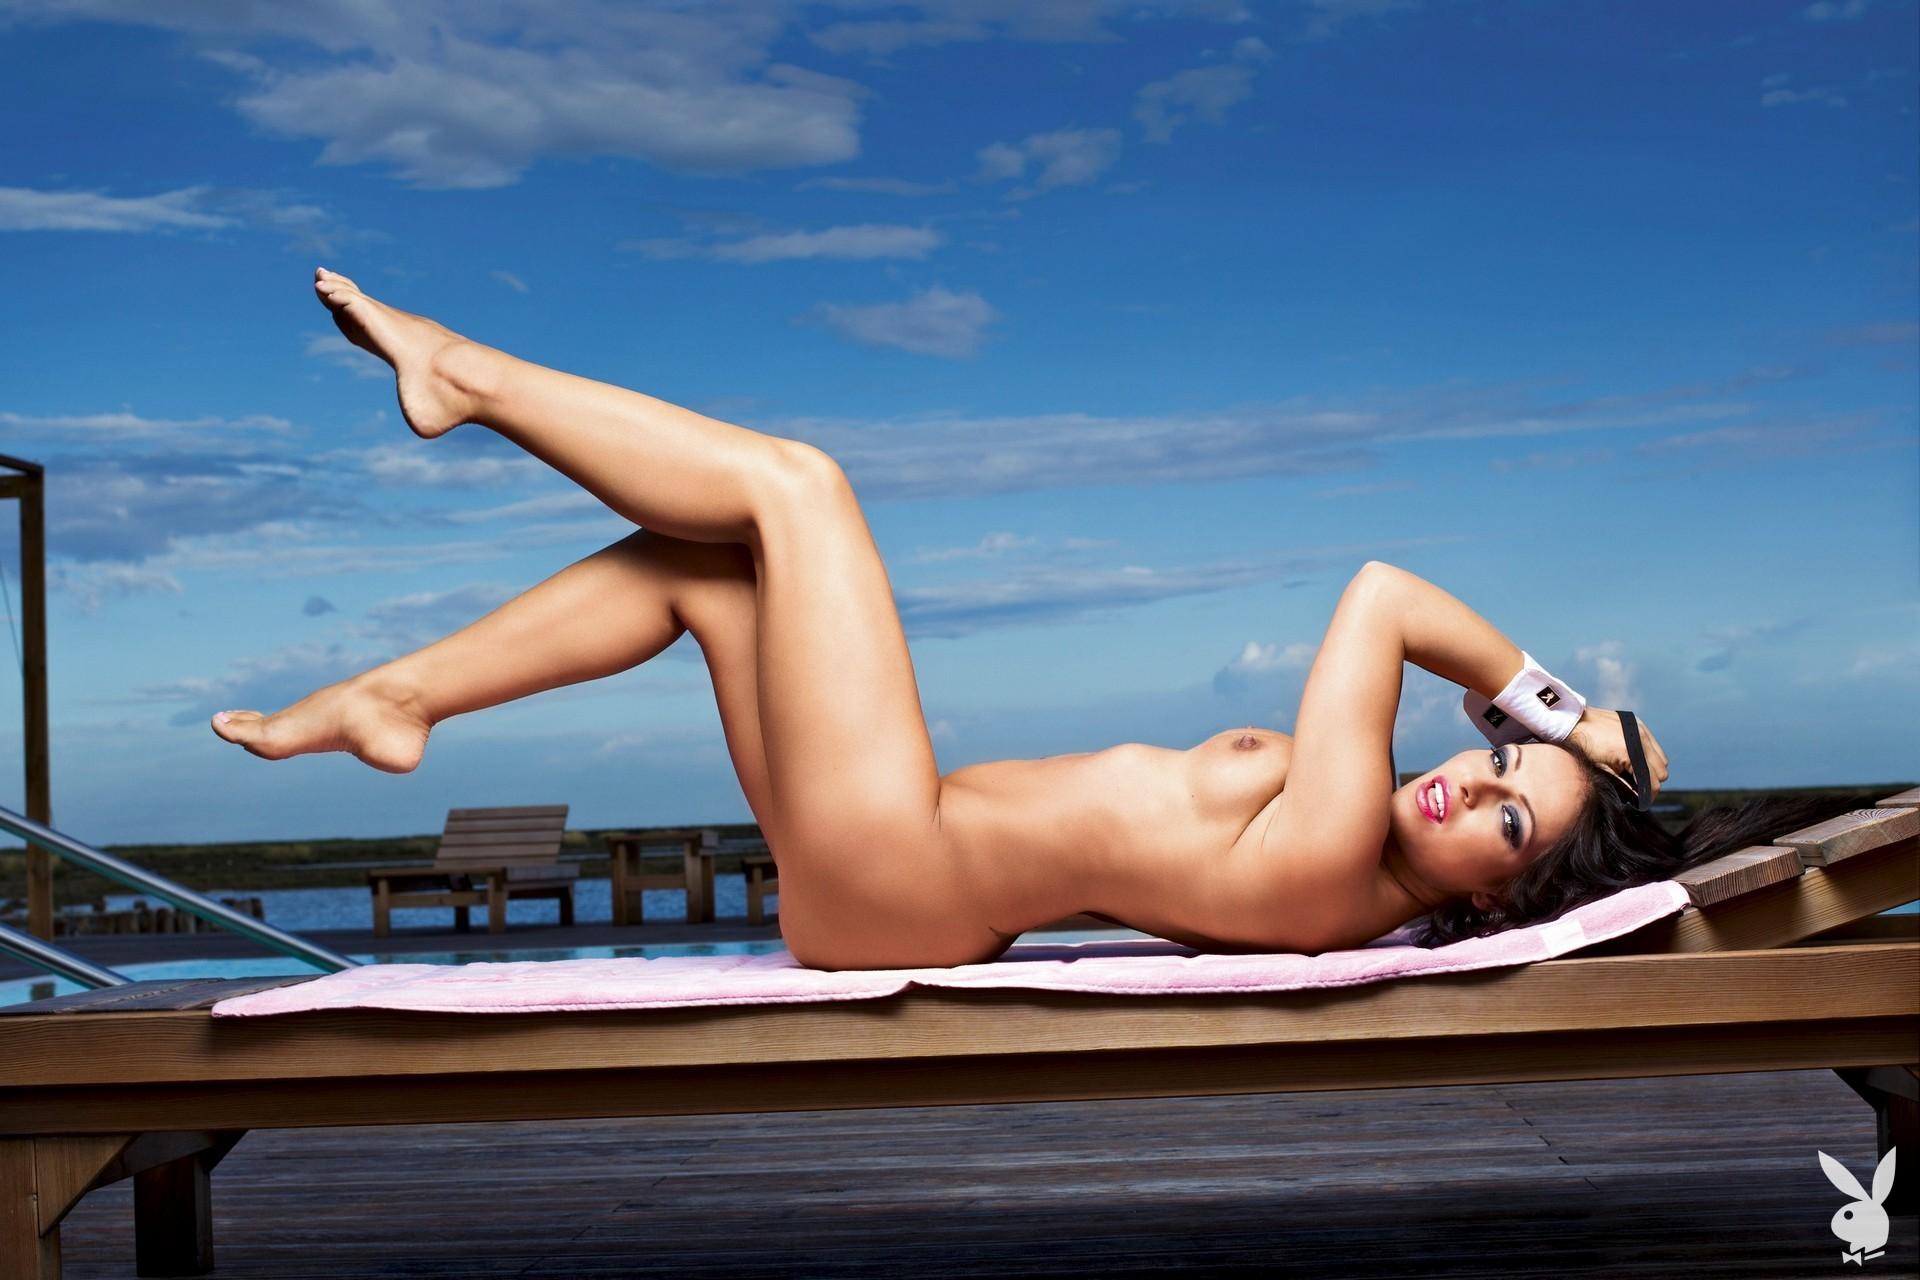 Ana Milinkovic - Playboy photoshoot